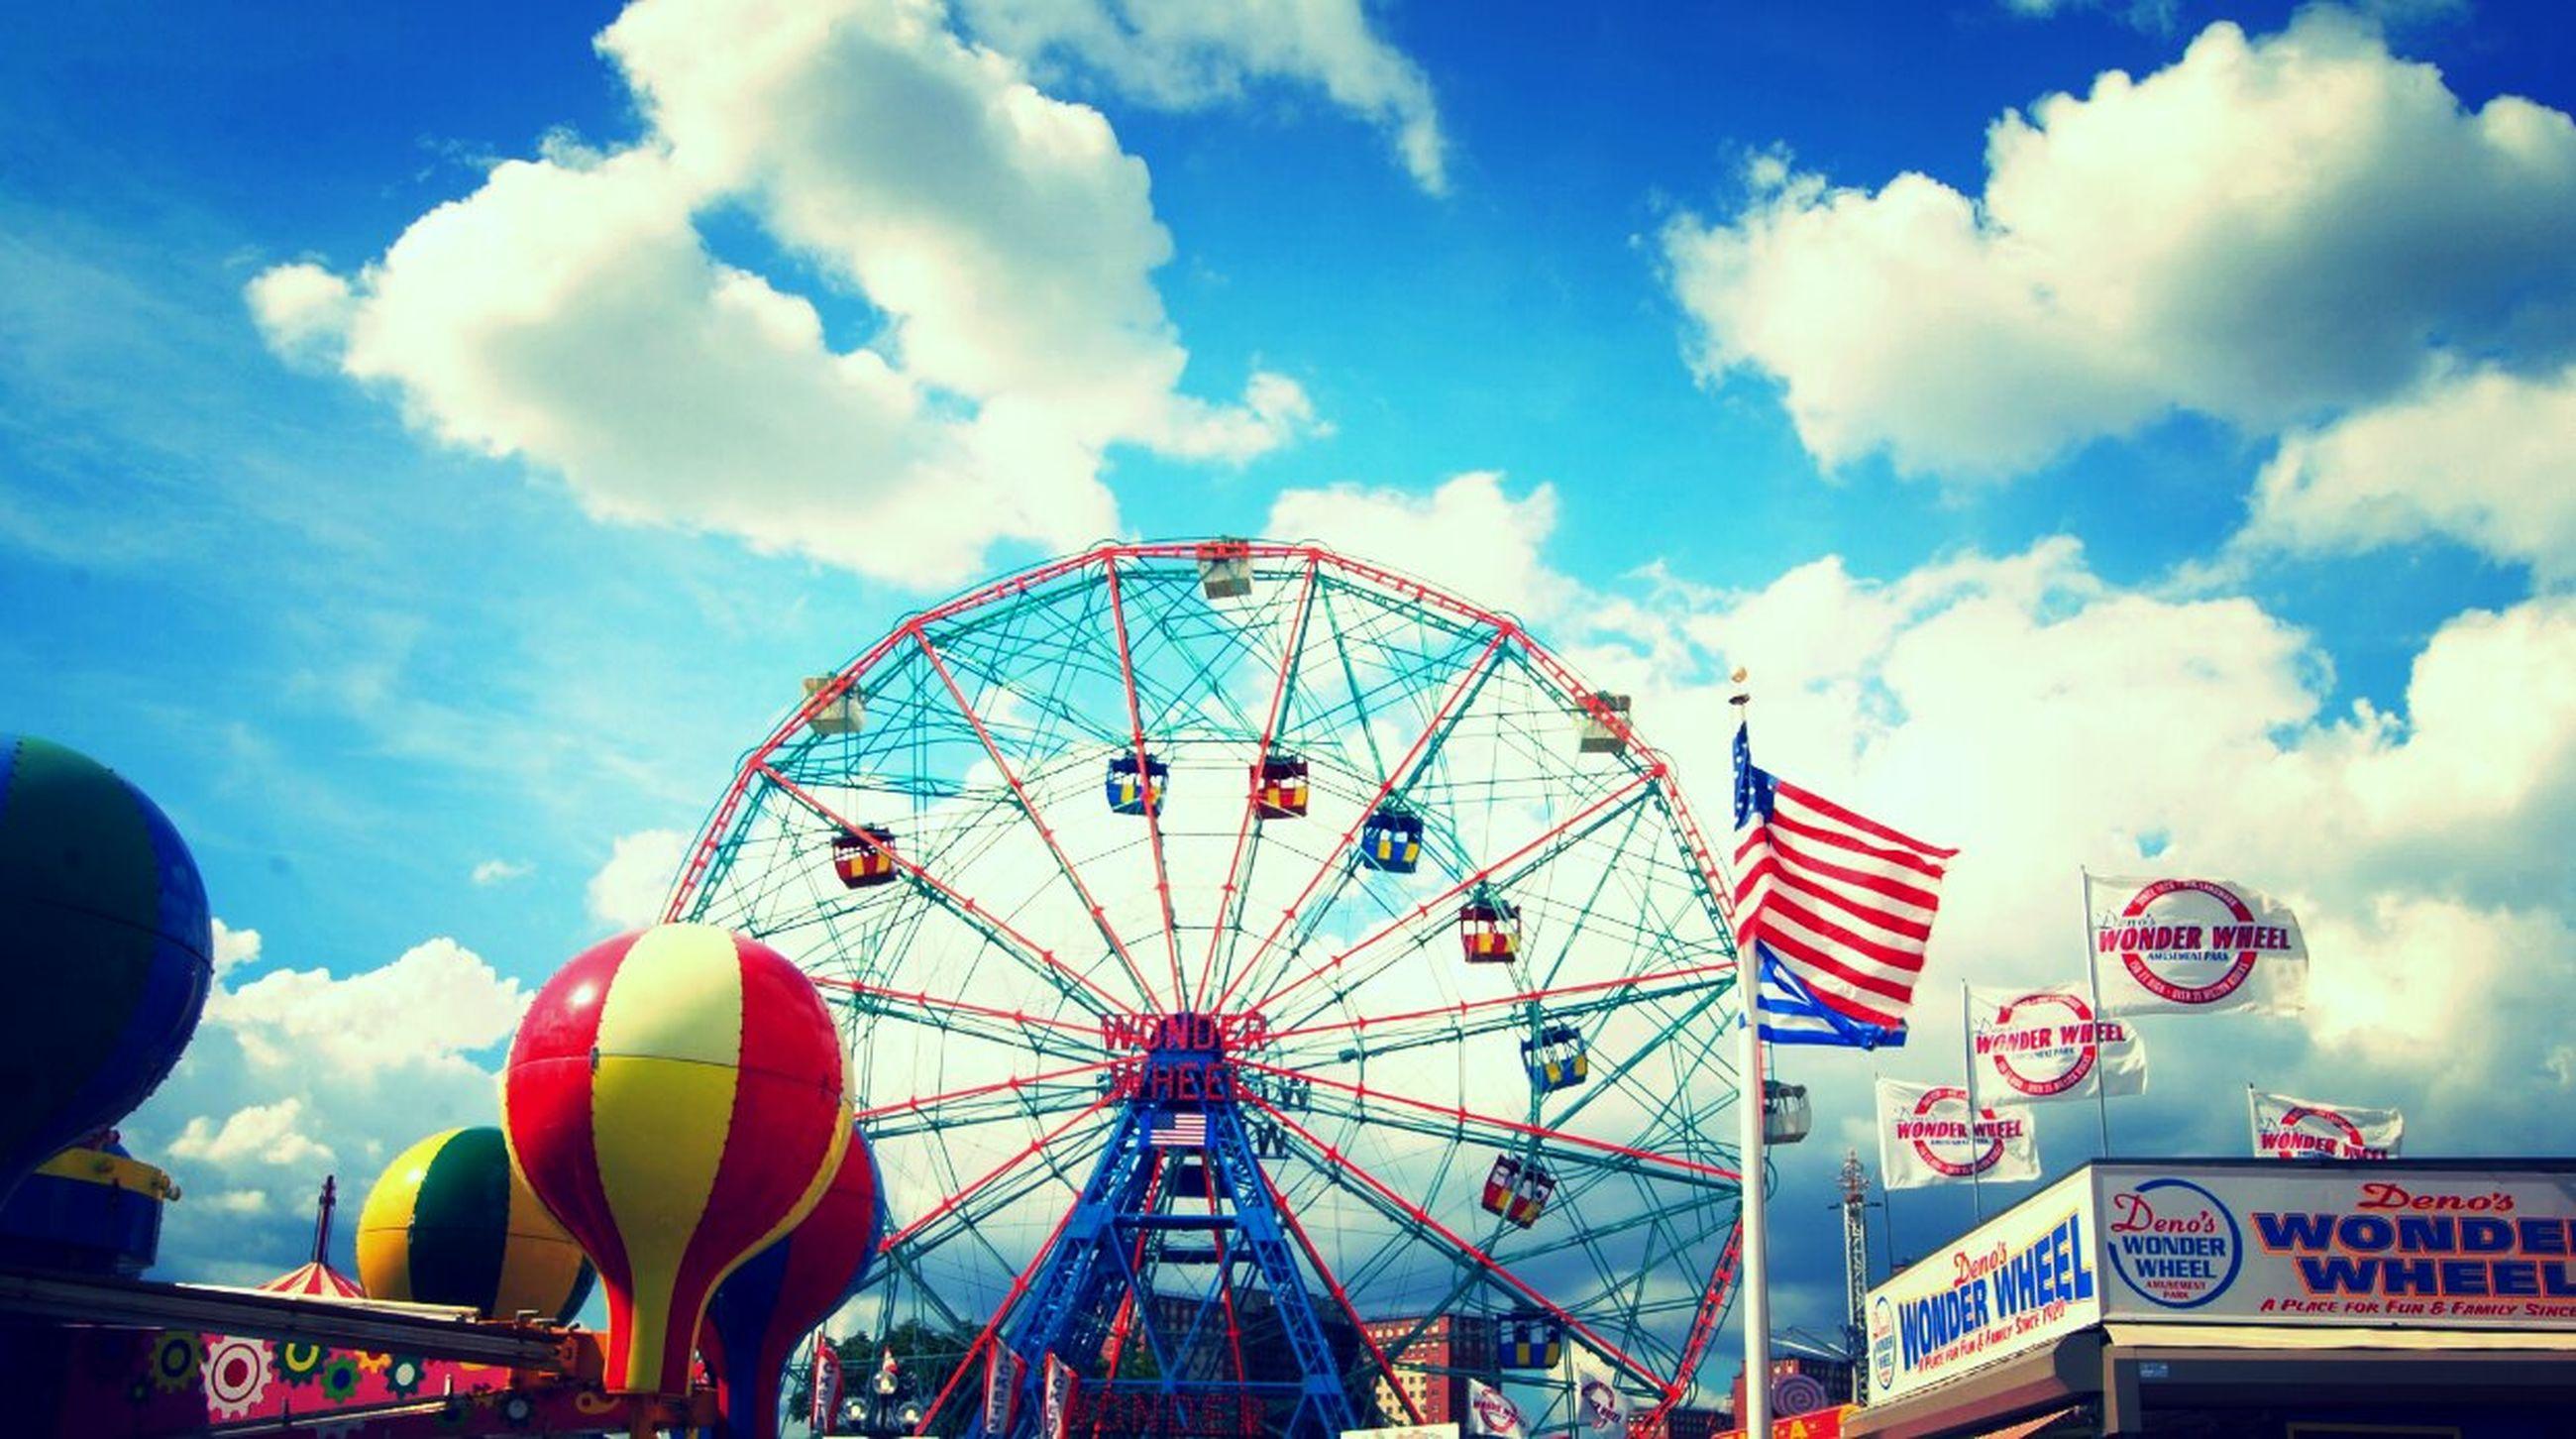 sky, amusement park, amusement park ride, ferris wheel, cloud - sky, arts culture and entertainment, low angle view, multi colored, built structure, cloud, cloudy, blue, architecture, fun, outdoors, day, leisure activity, no people, enjoyment, travel